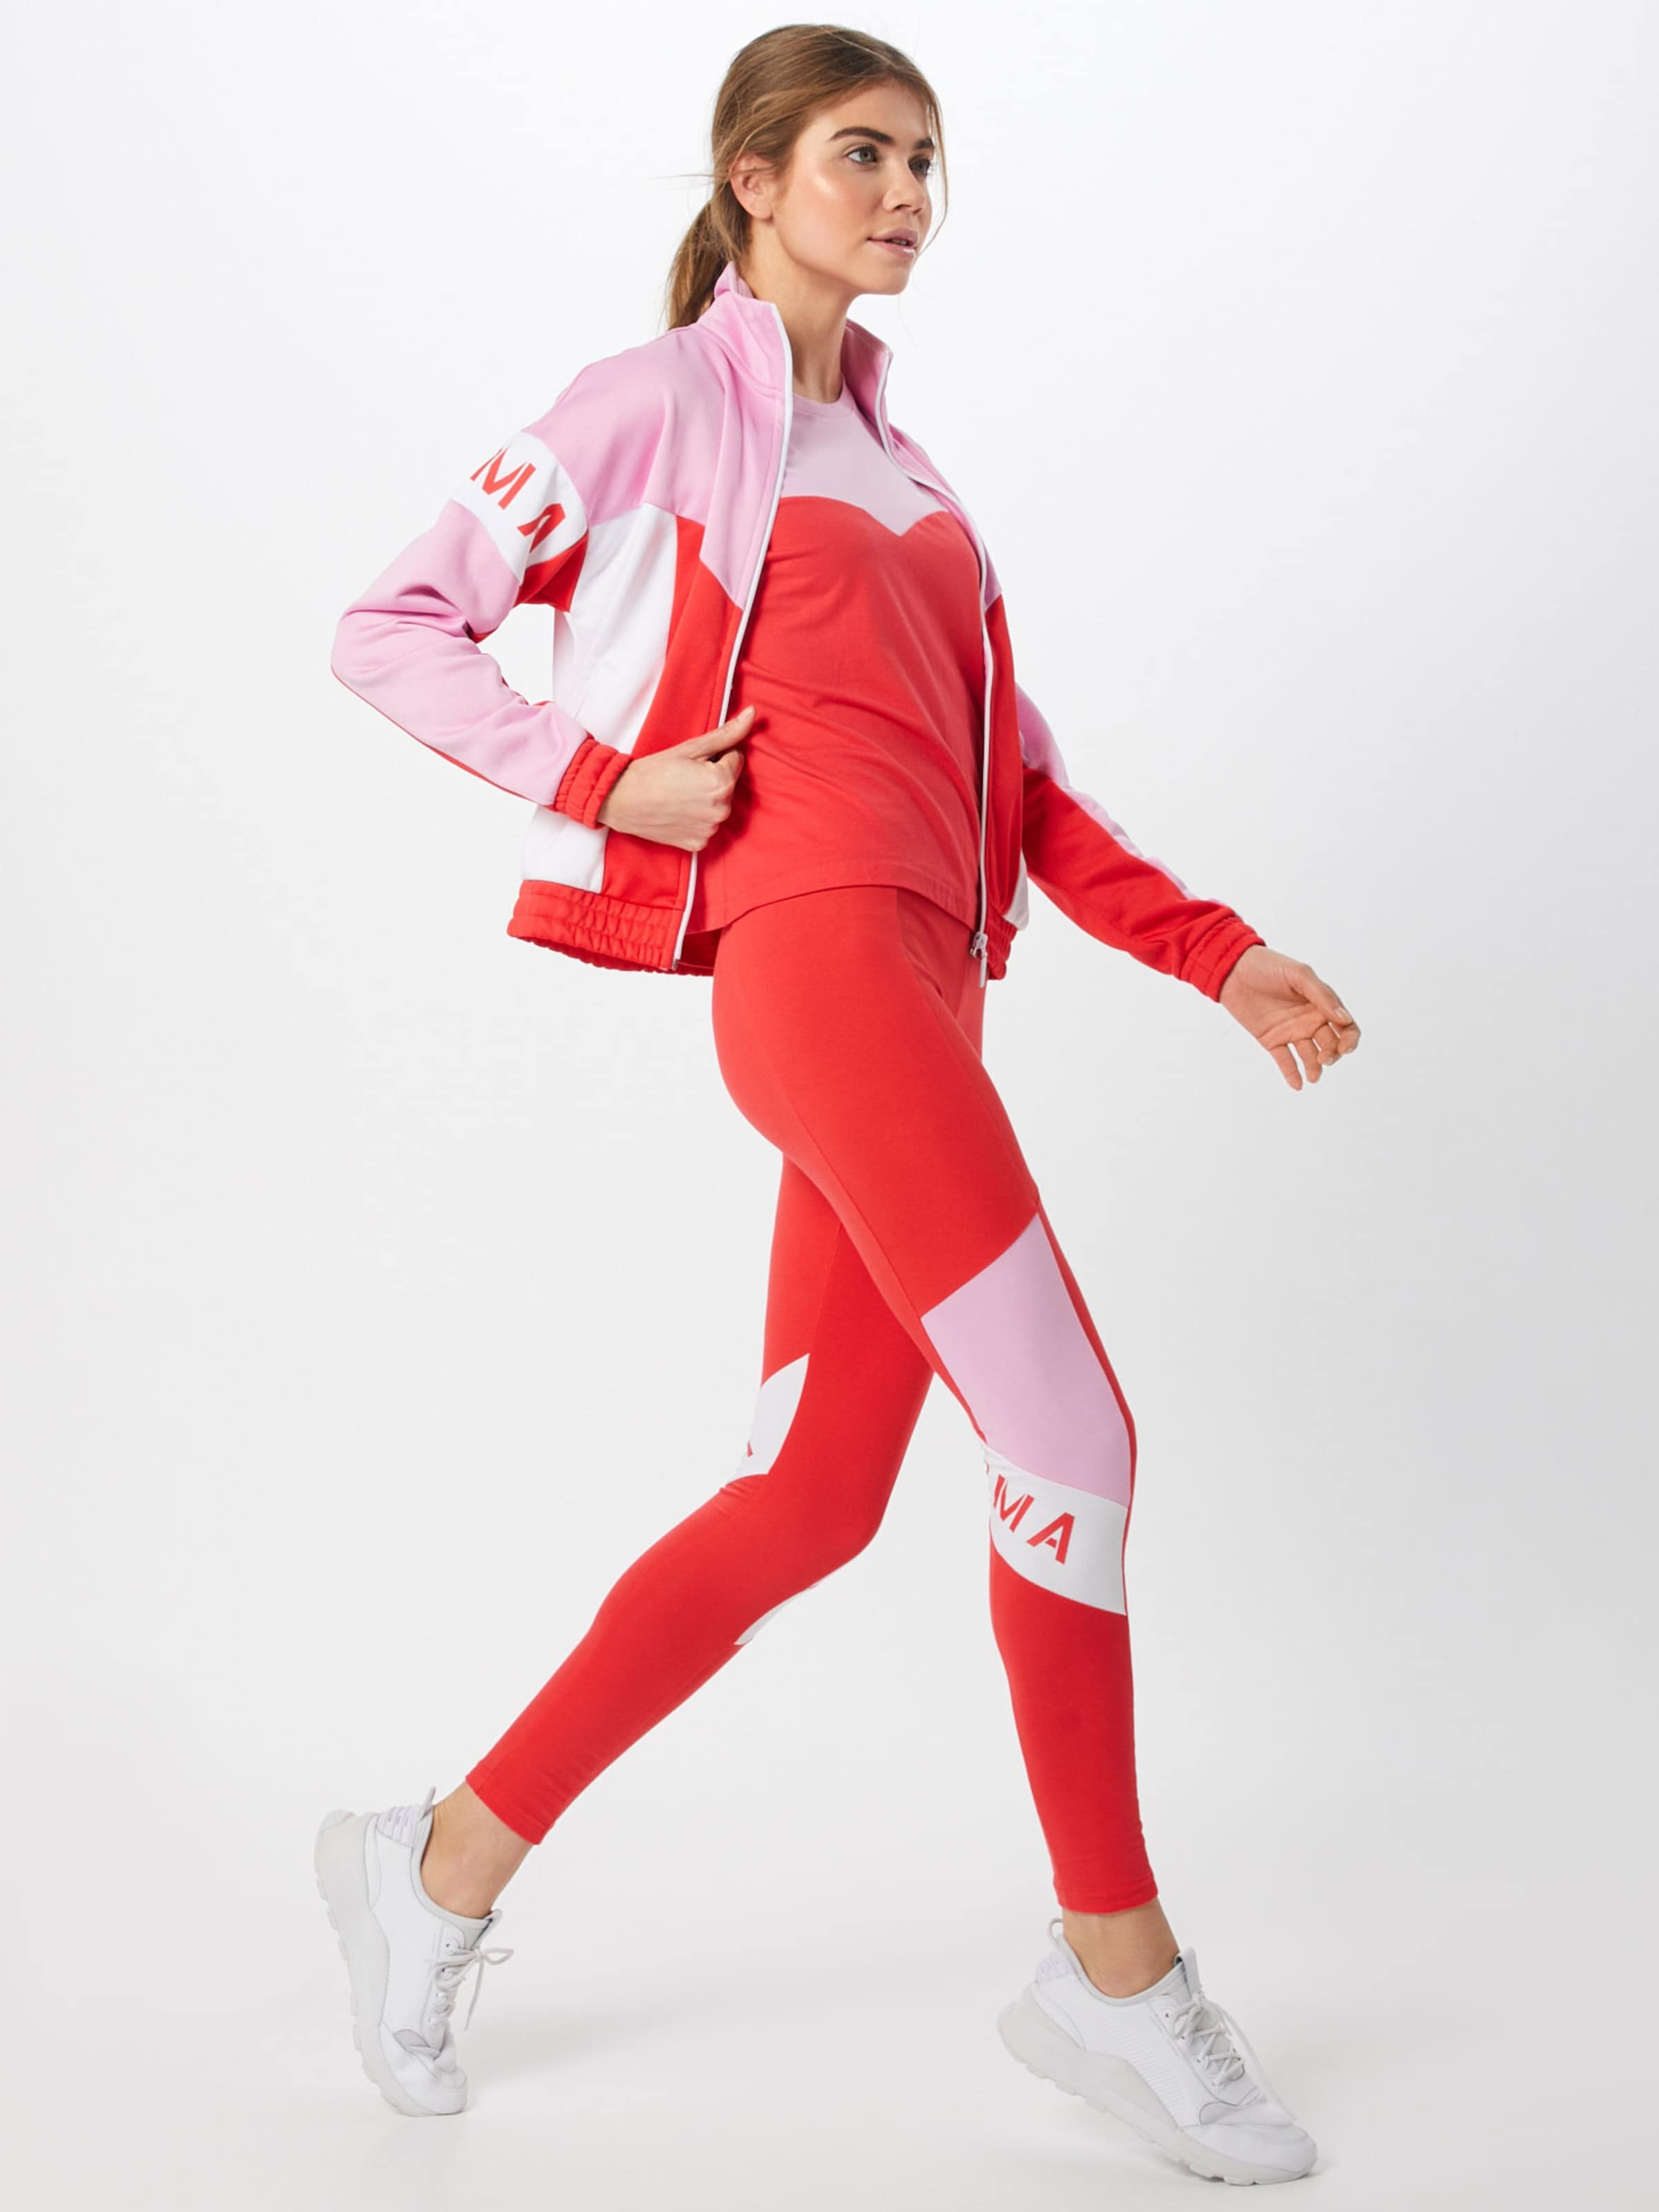 Puma Roserouge Colorblock' Shirt T Y6f7byg En Blanc 'xtg GSzpLjqUVM